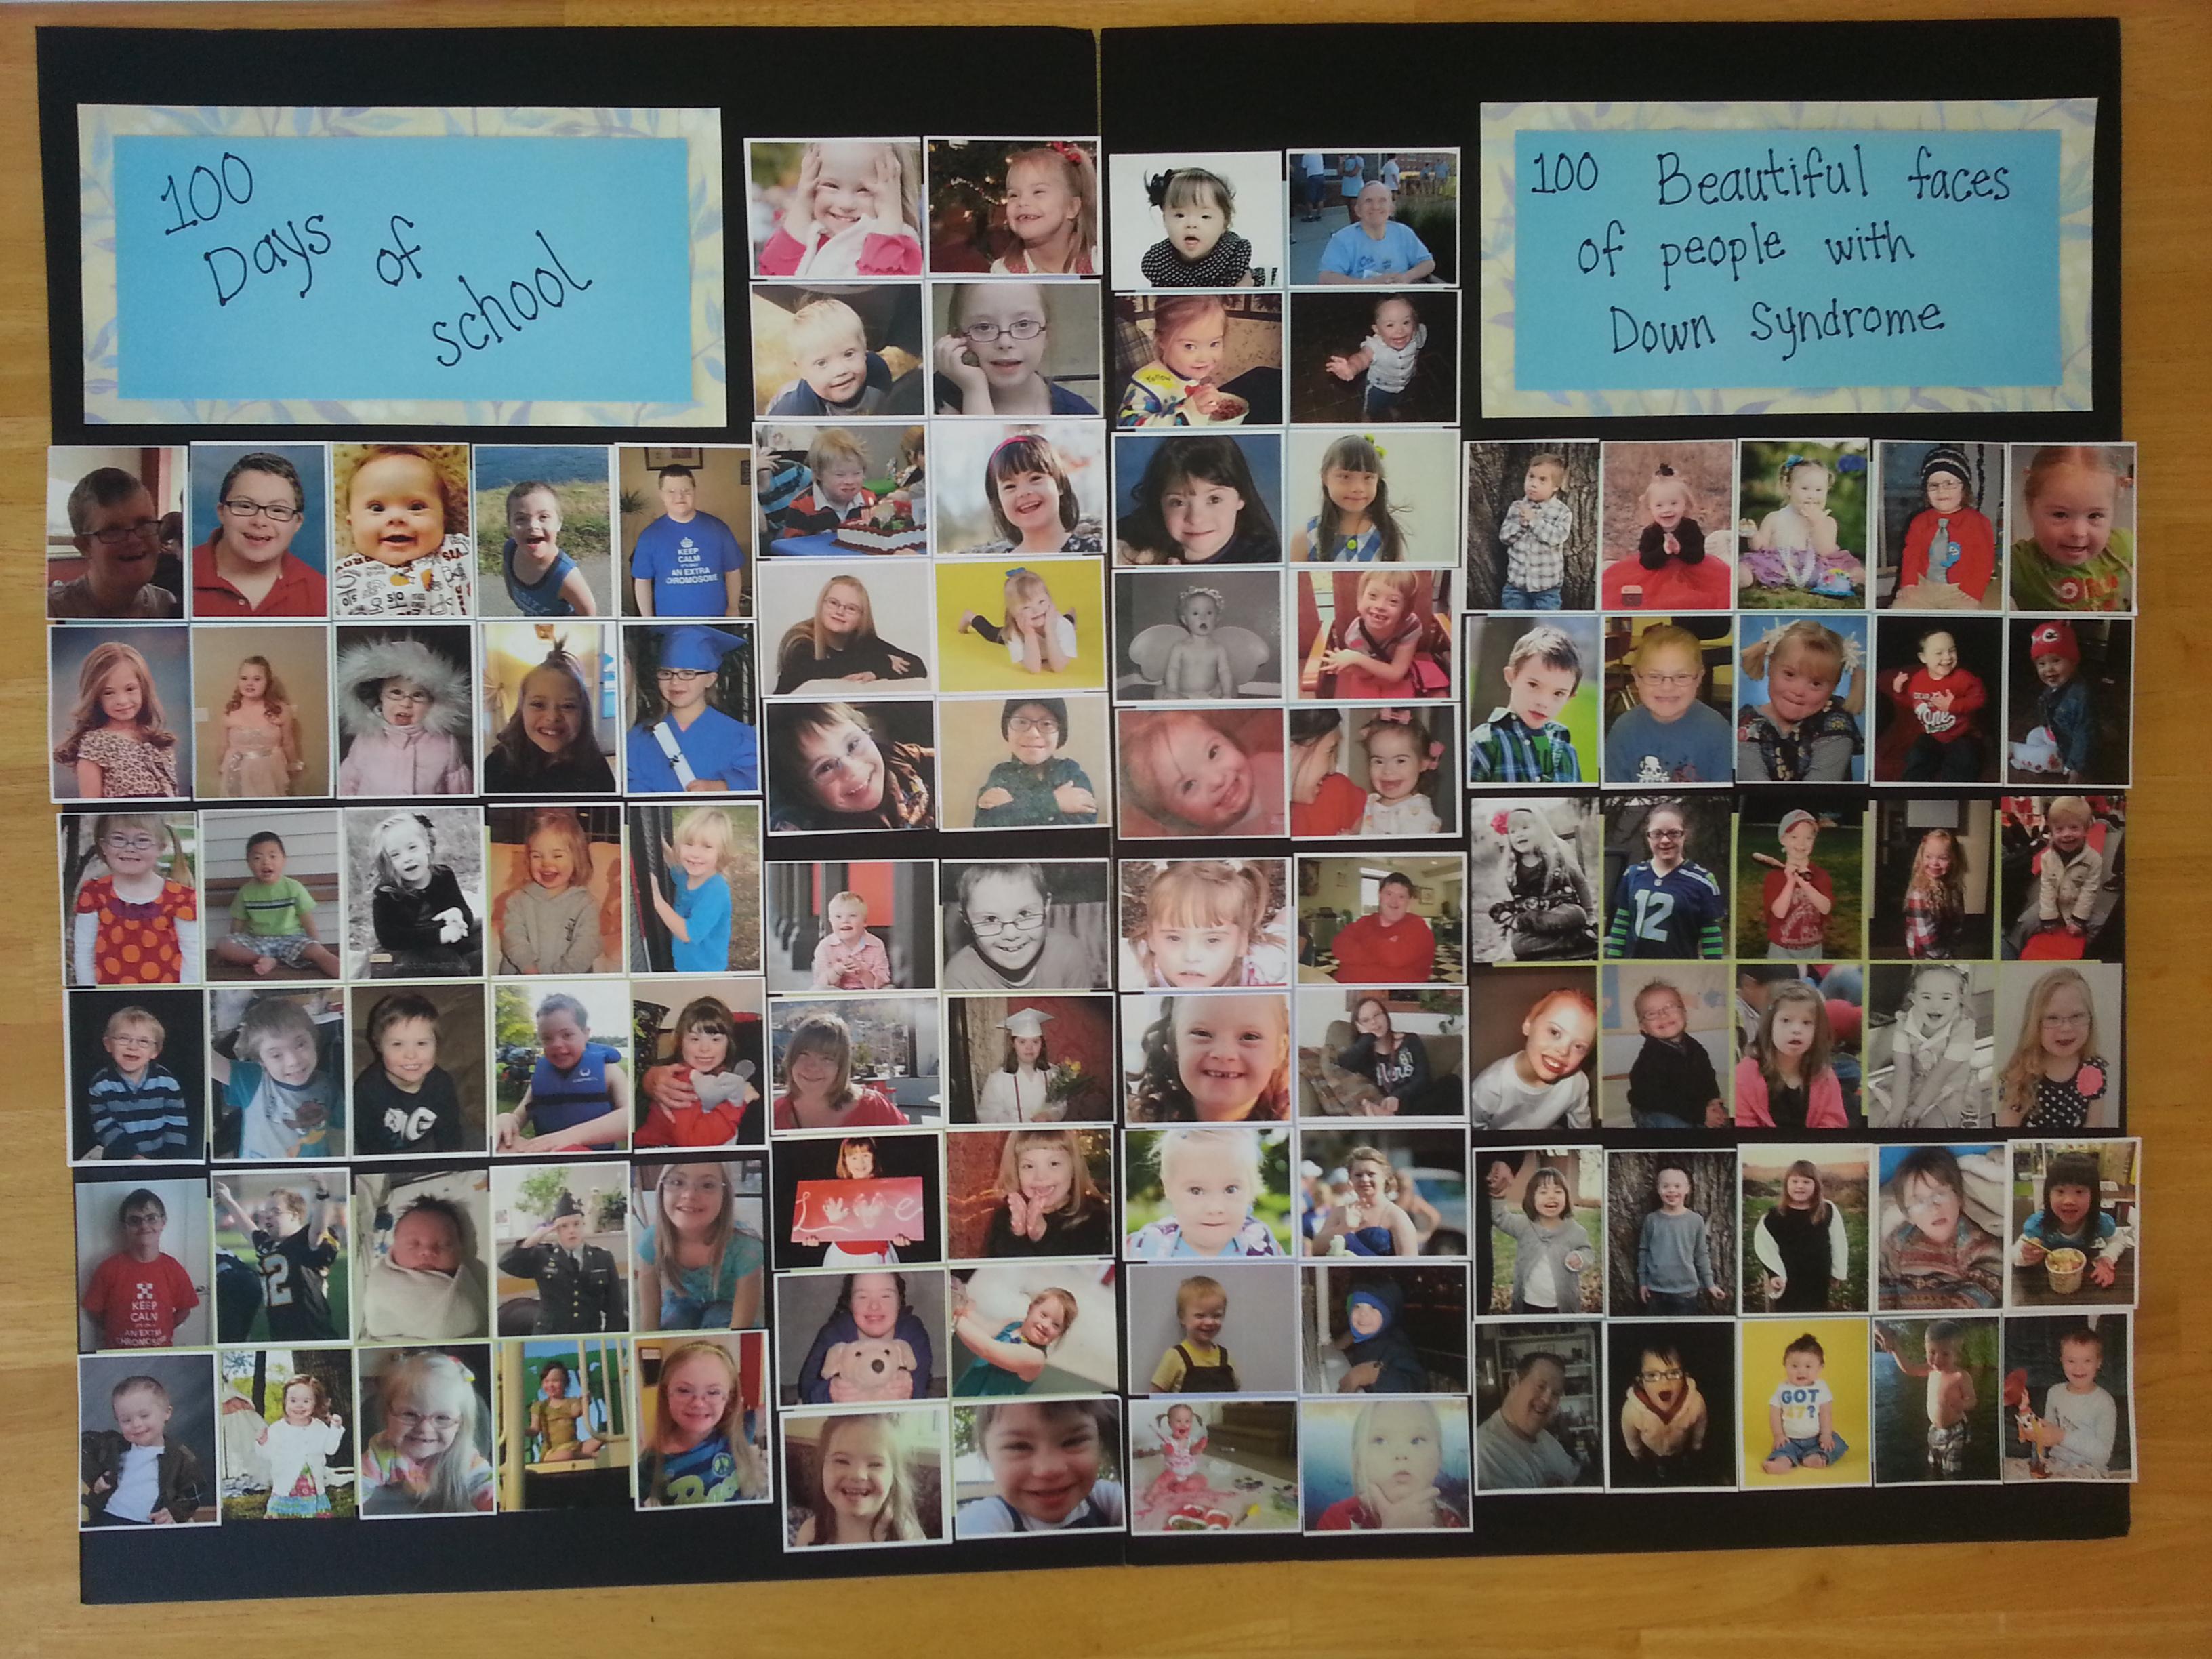 100 beautiful faces